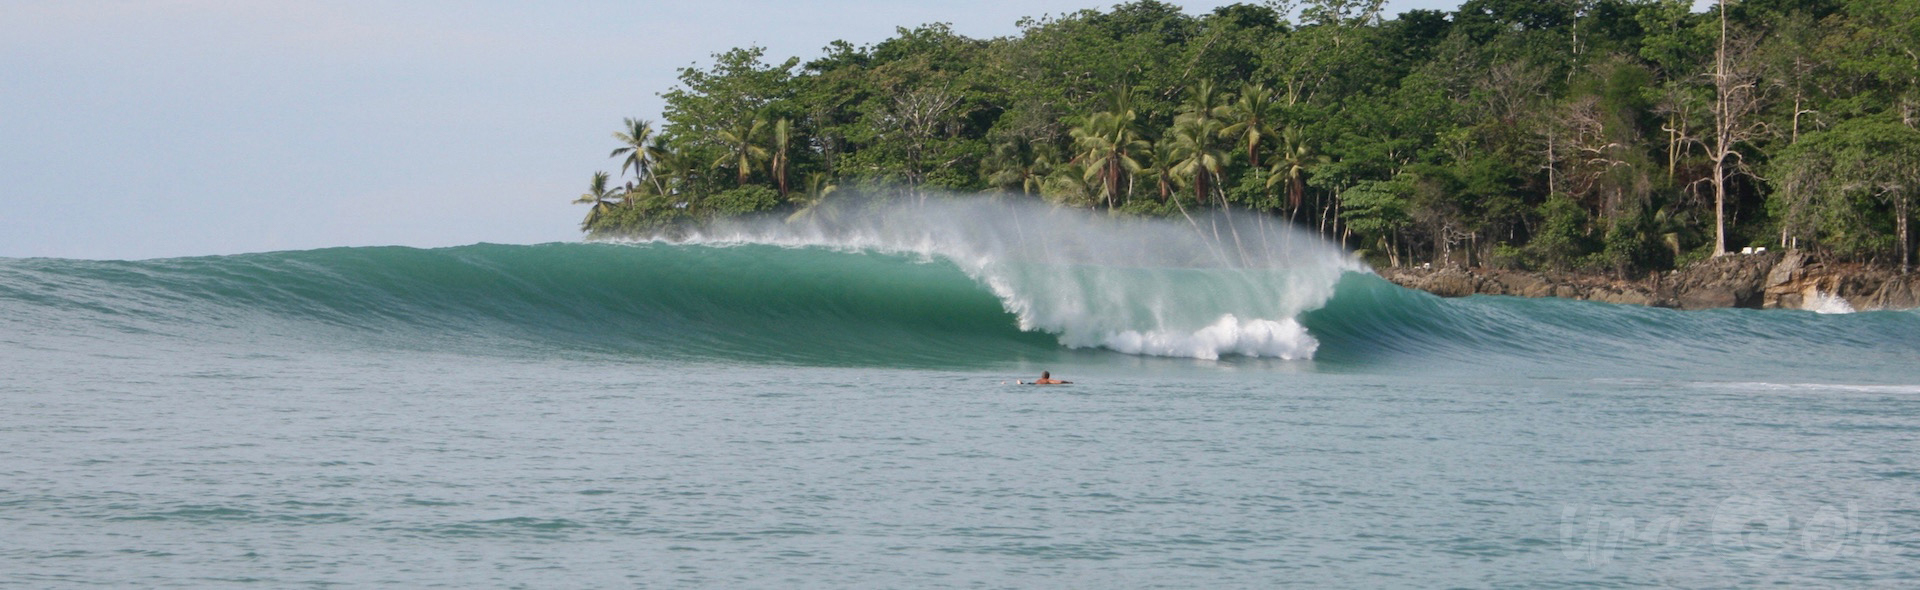 Cabo Matapalo Surf Boat Tours